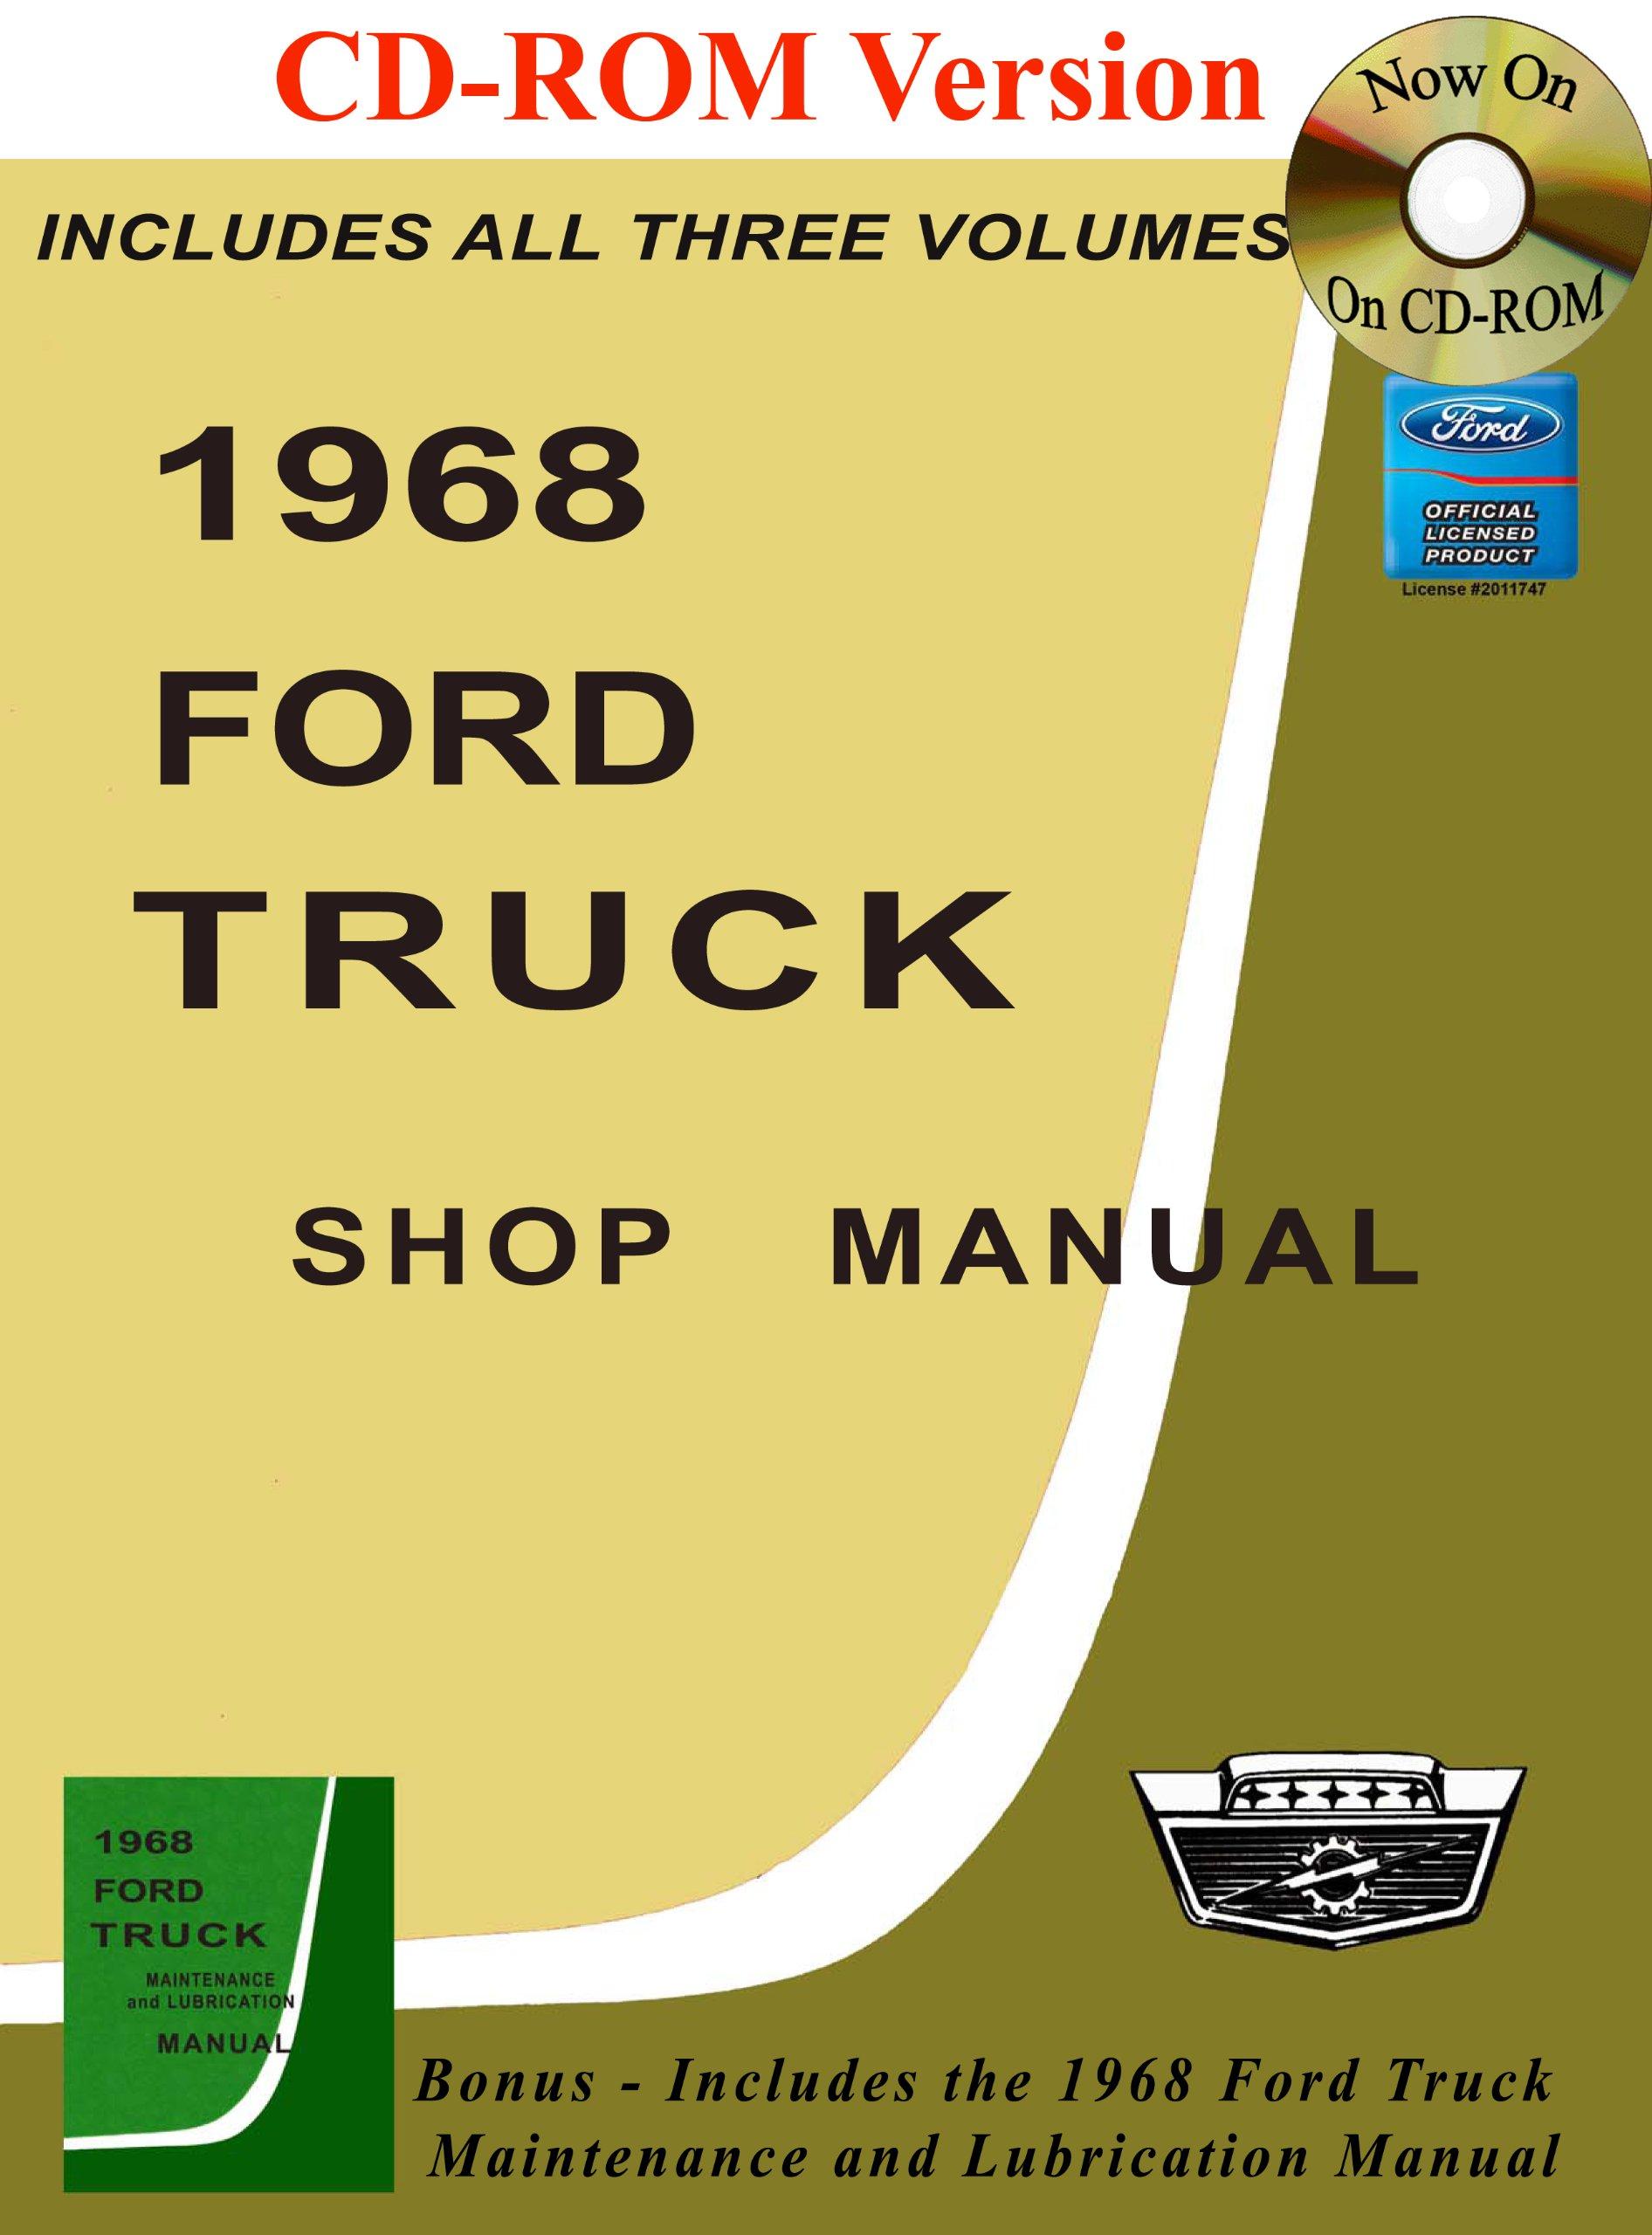 1968 ford truck shop manual ford motor company david e leblanc rh amazon com Ford F-150 Manual Book Ford F-150